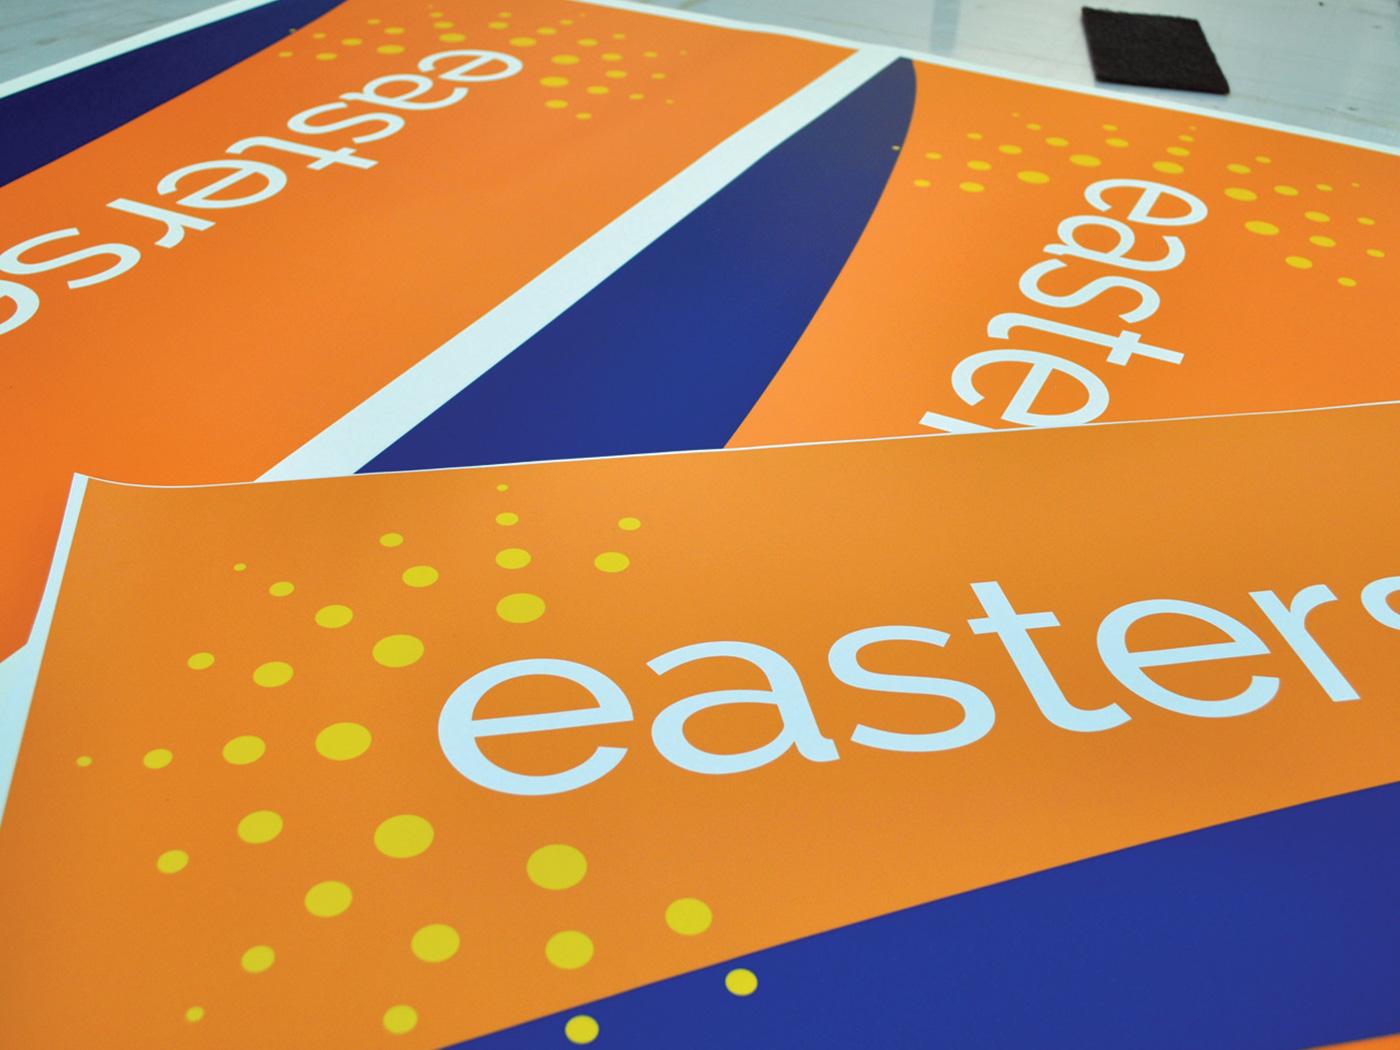 Easterseals brand identity